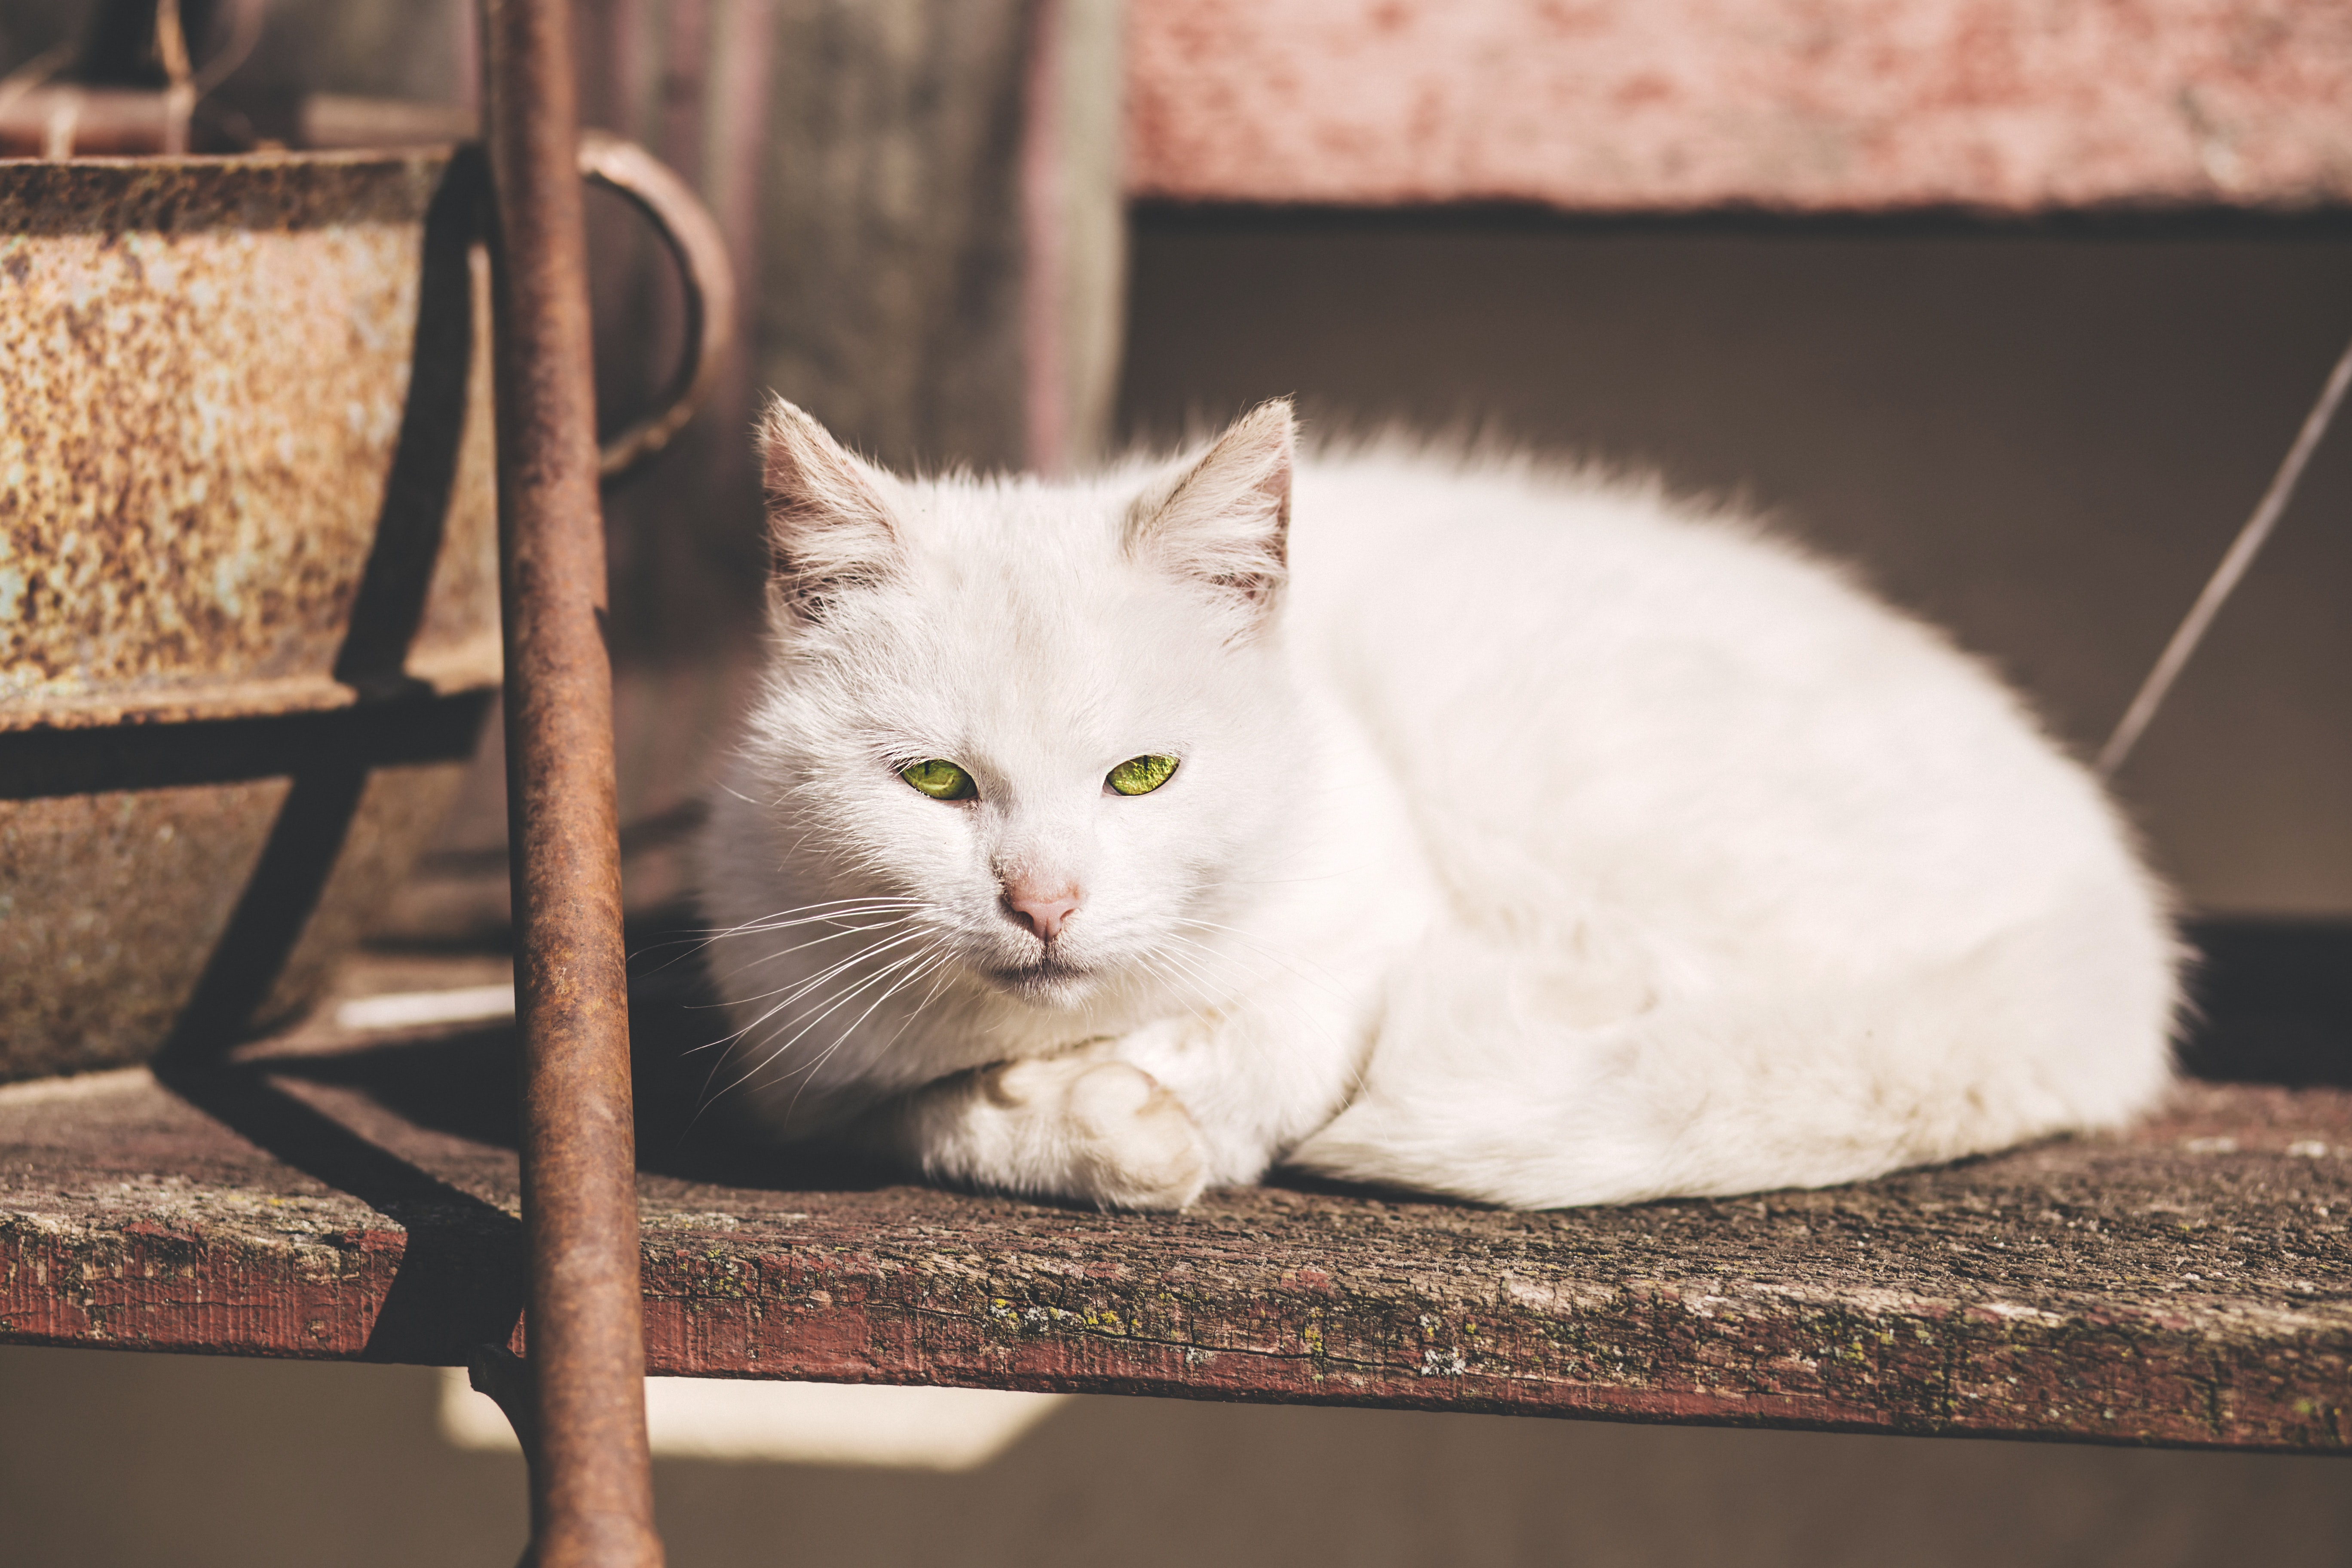 White short fur cat near brown metal rod photo